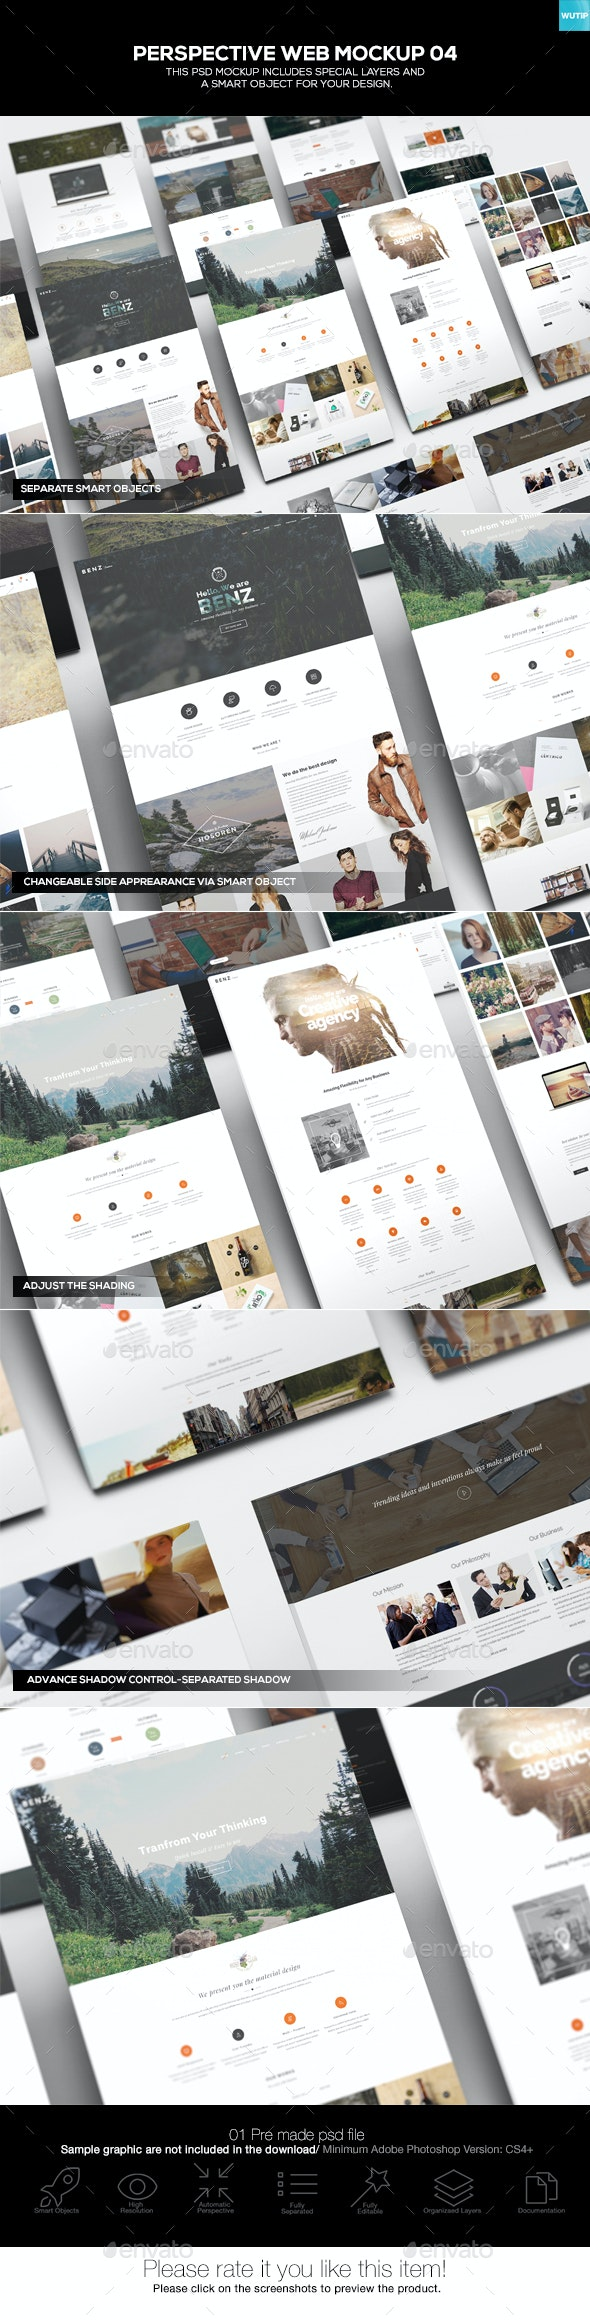 Perspective Web Mockup 04 - Website Displays